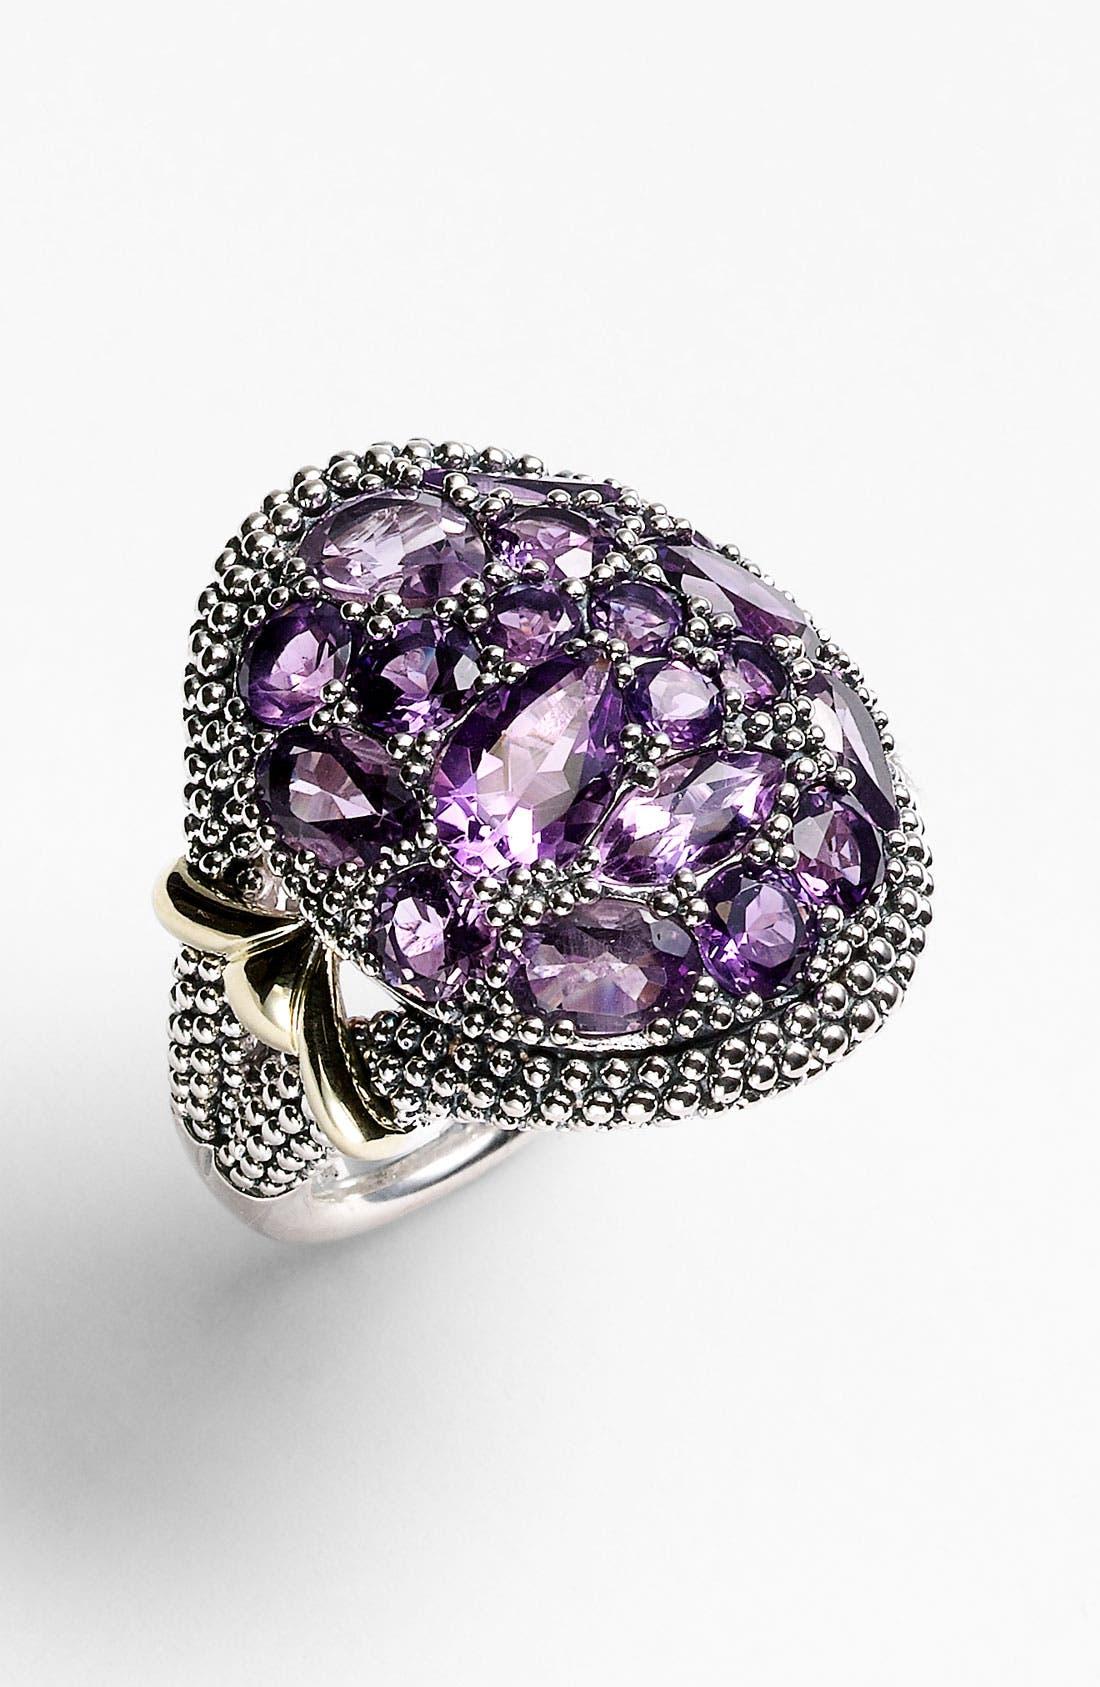 Main Image - LAGOS 'Ombré' Multi Stone Ring